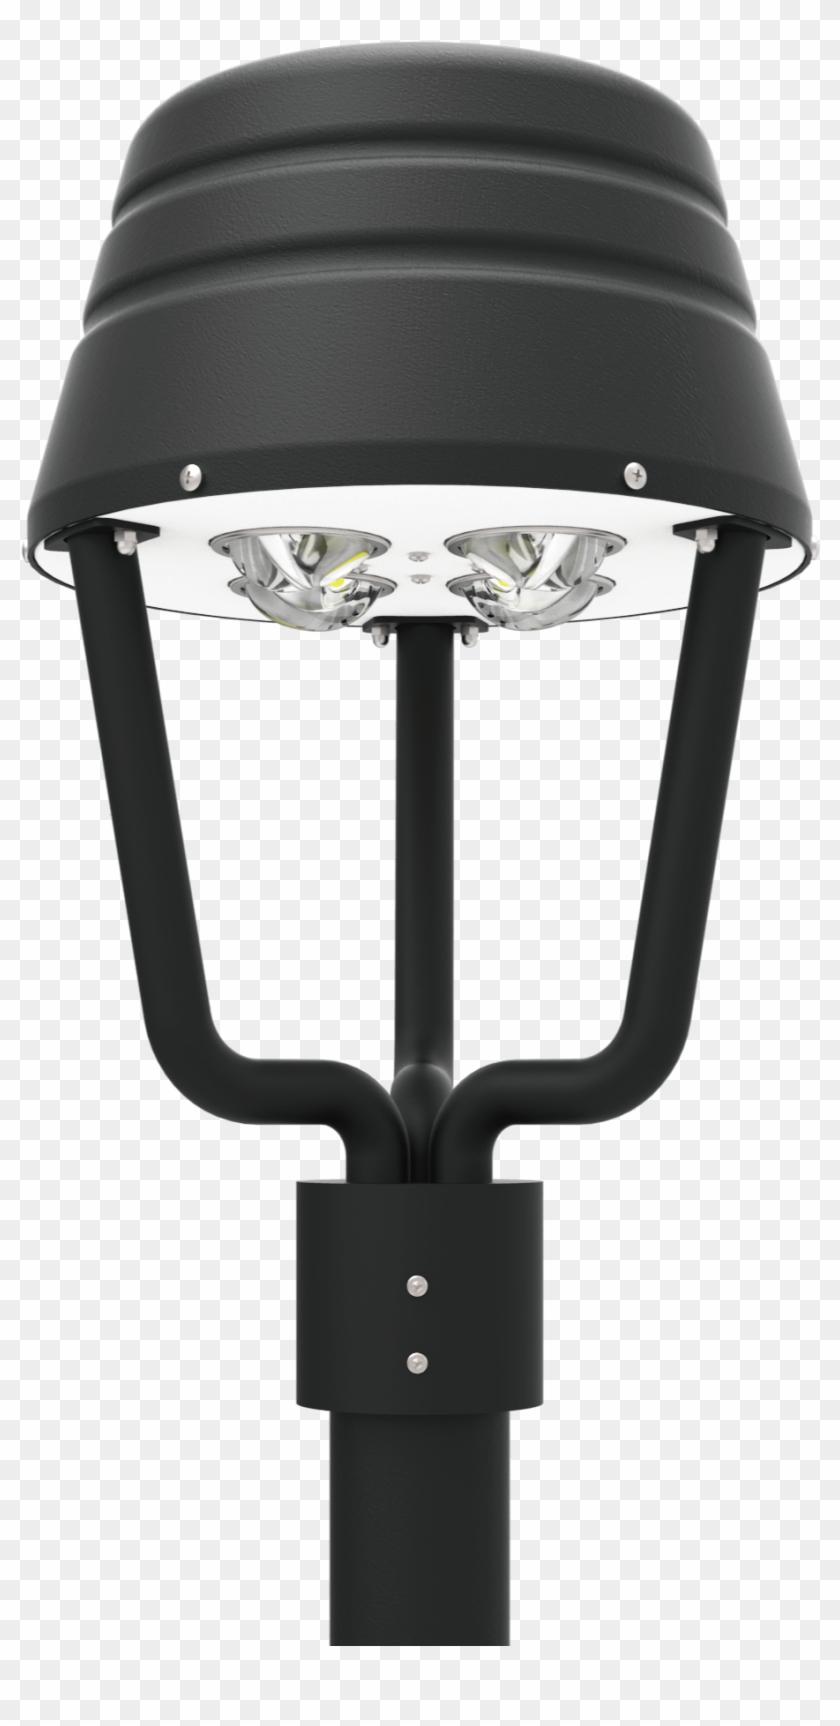 Led Post Top Light Fixtures - Ceiling Fixture Clipart #5117832